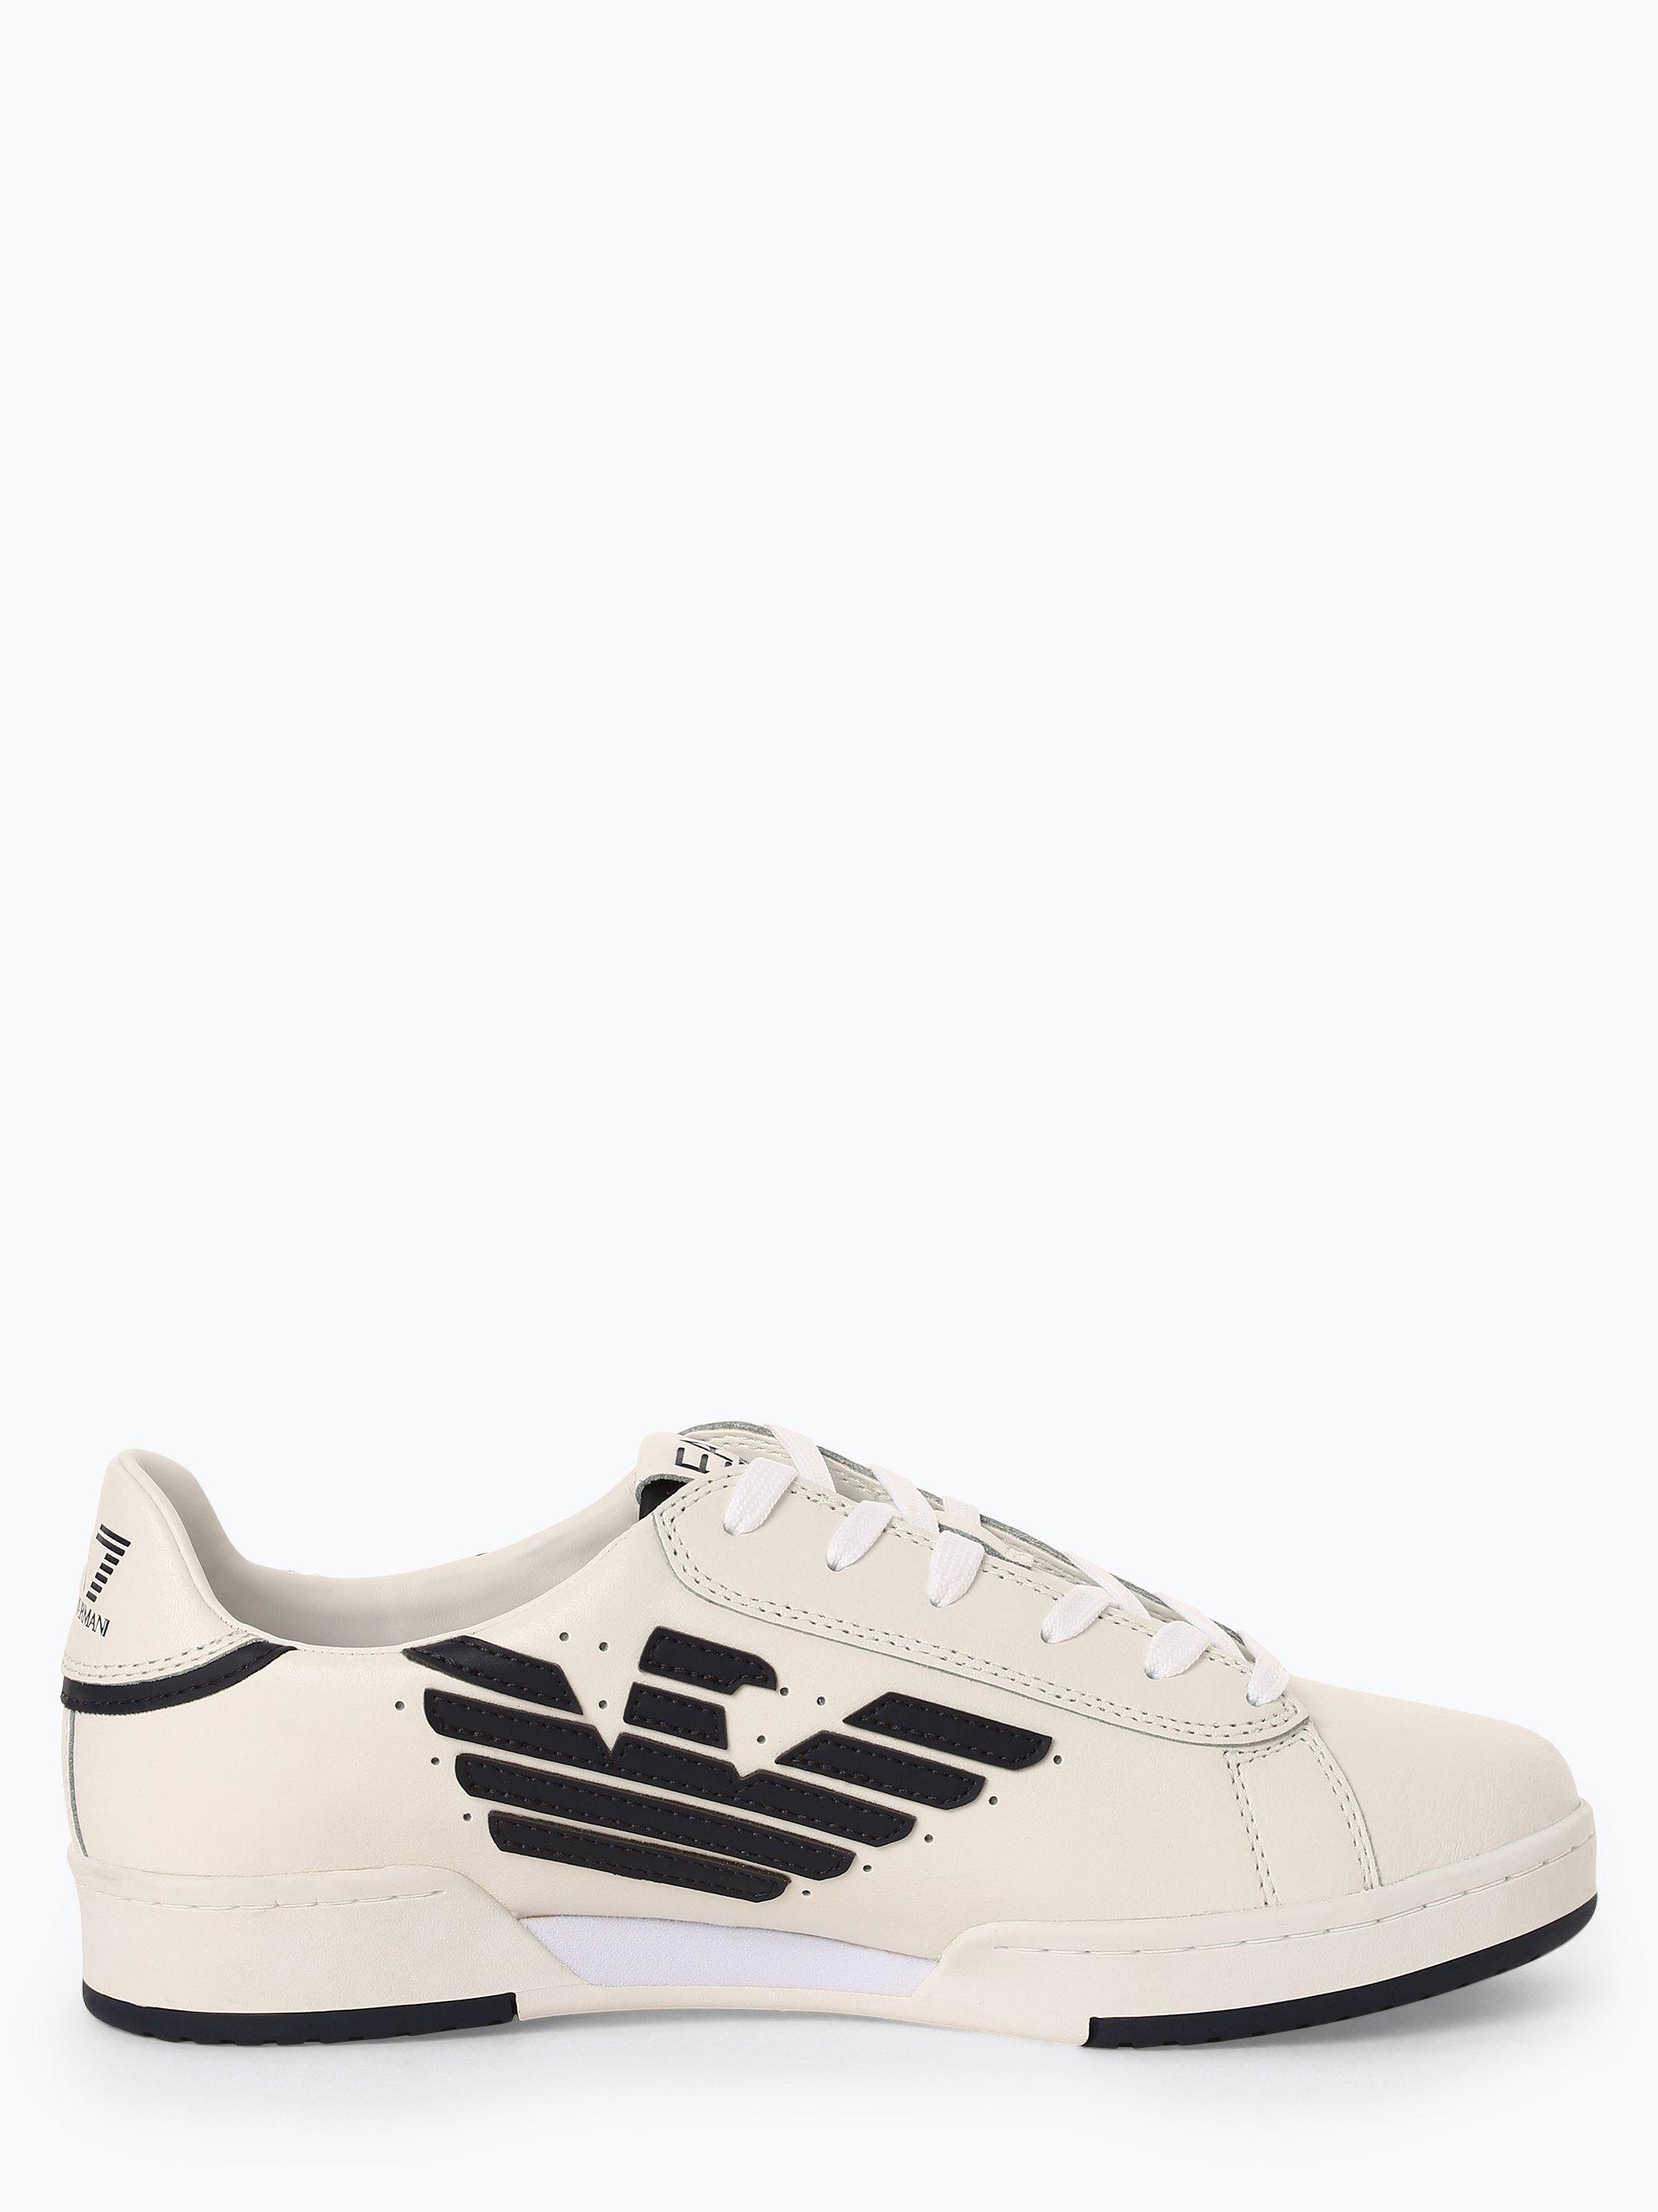 EA7 Emporio Armani Herren Sneaker mit Leder-Anteil